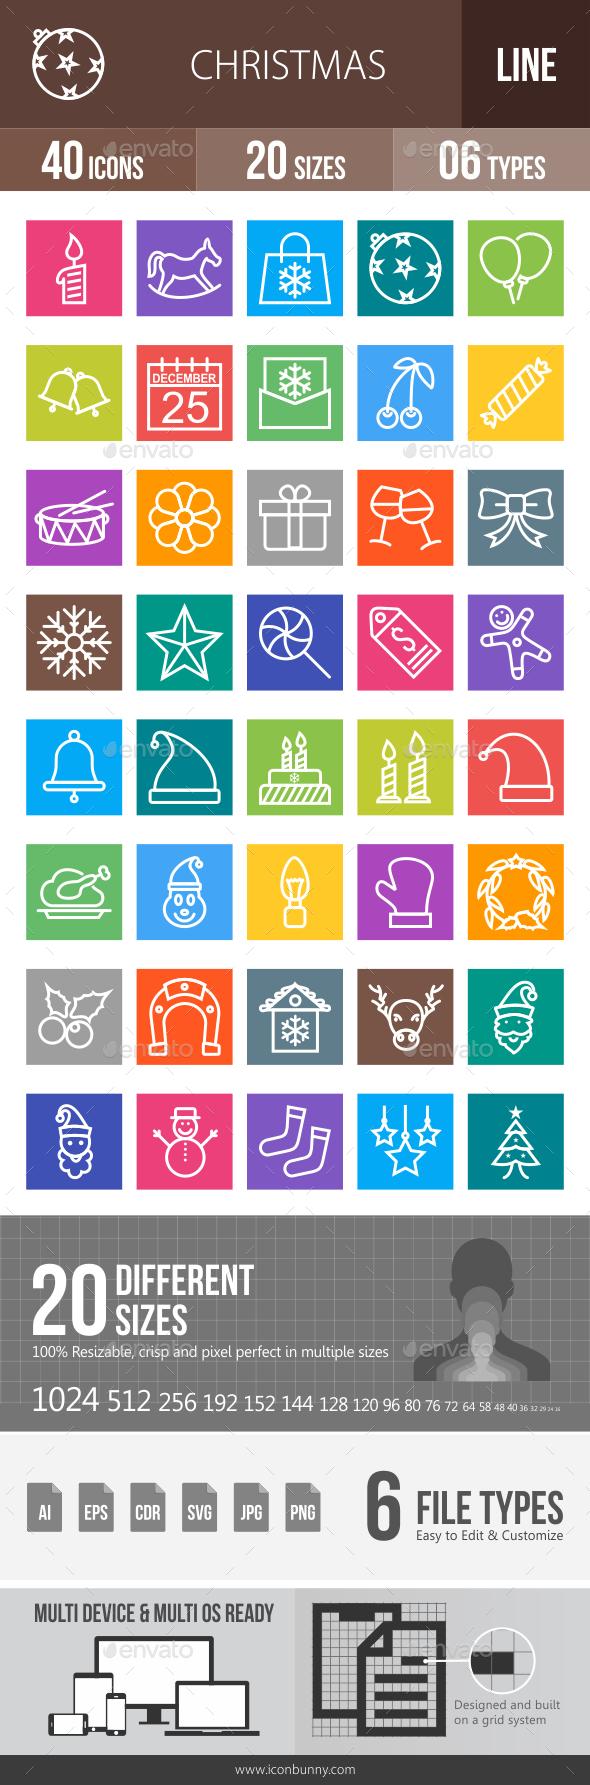 40 Christmas Line Multicolor B/G Icons - Icons